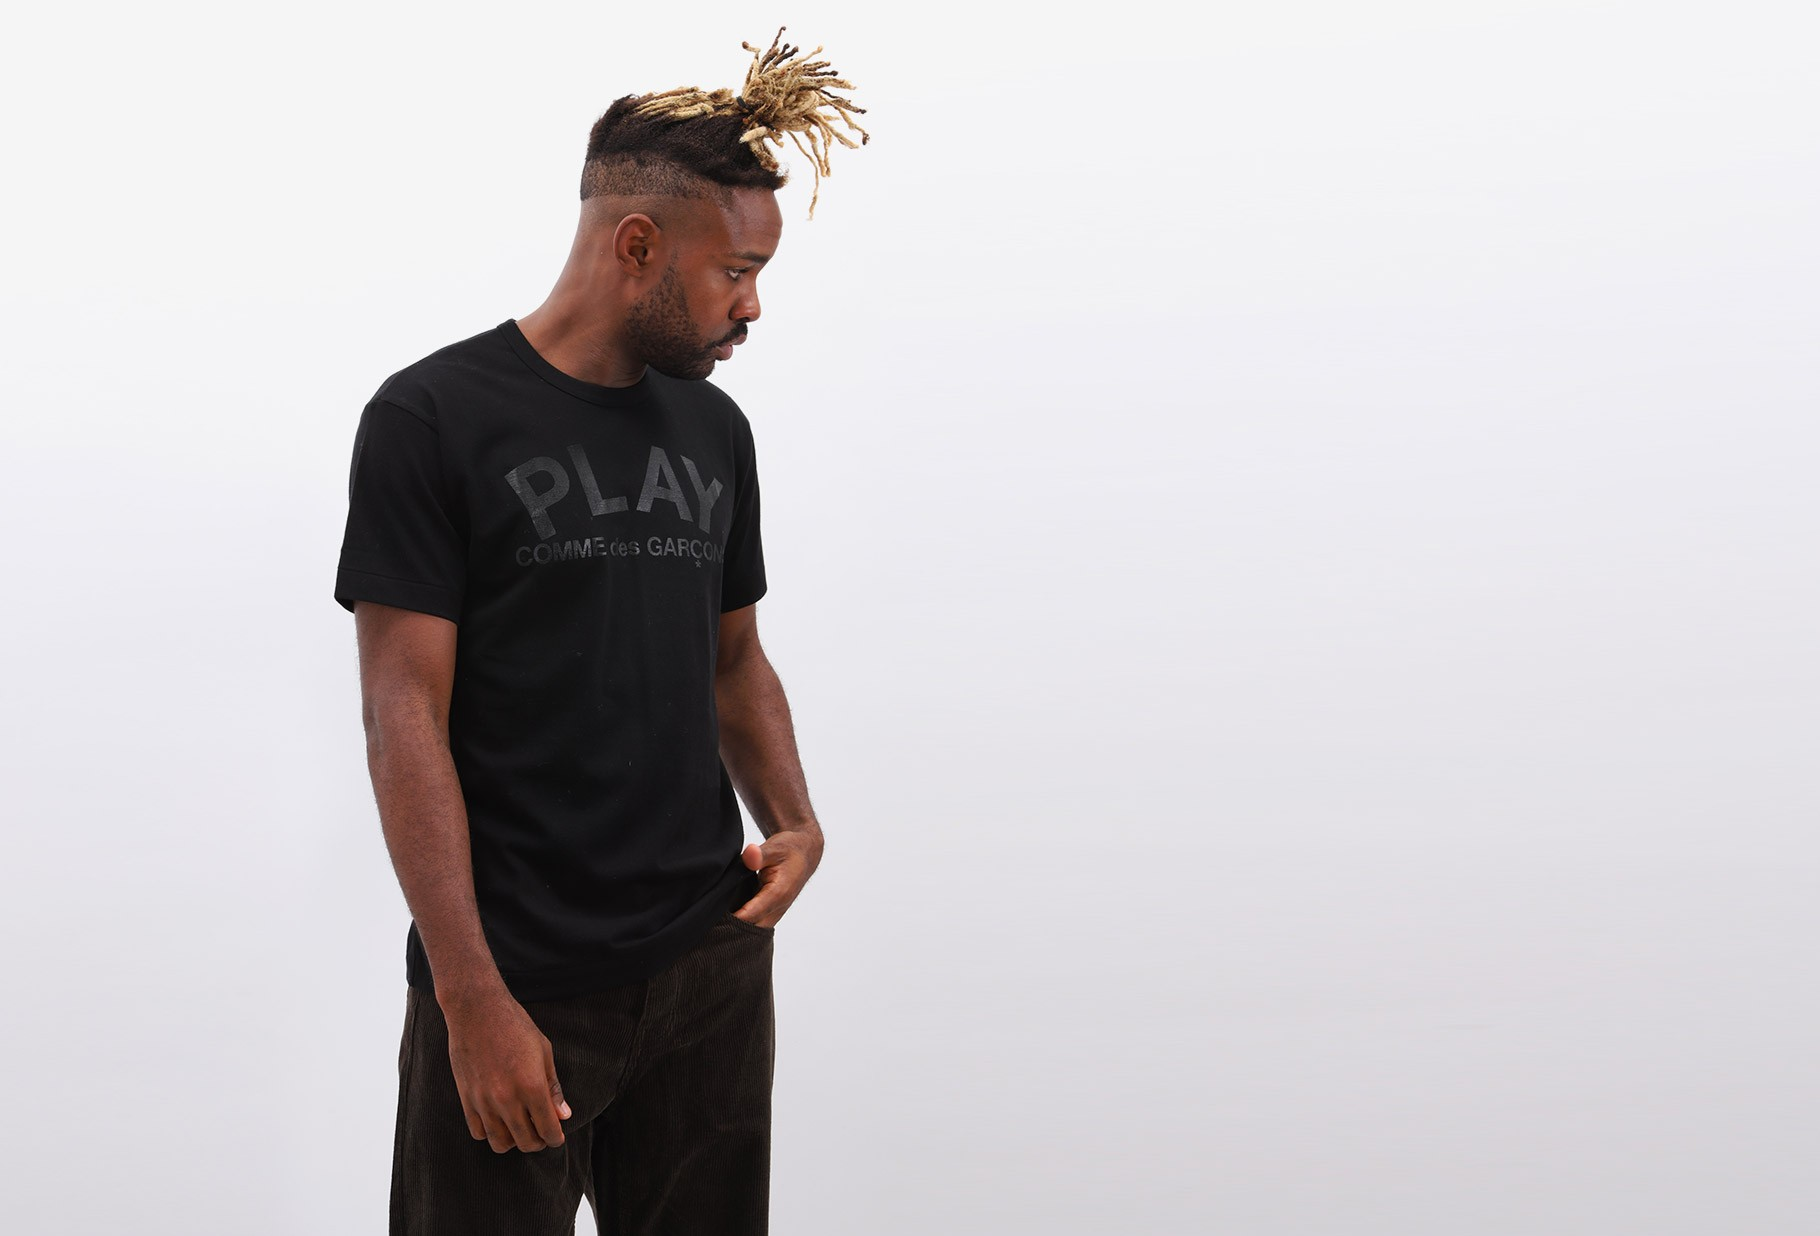 COMME DES GARÇONS PLAY / Play comme des garçons t-shirt Black